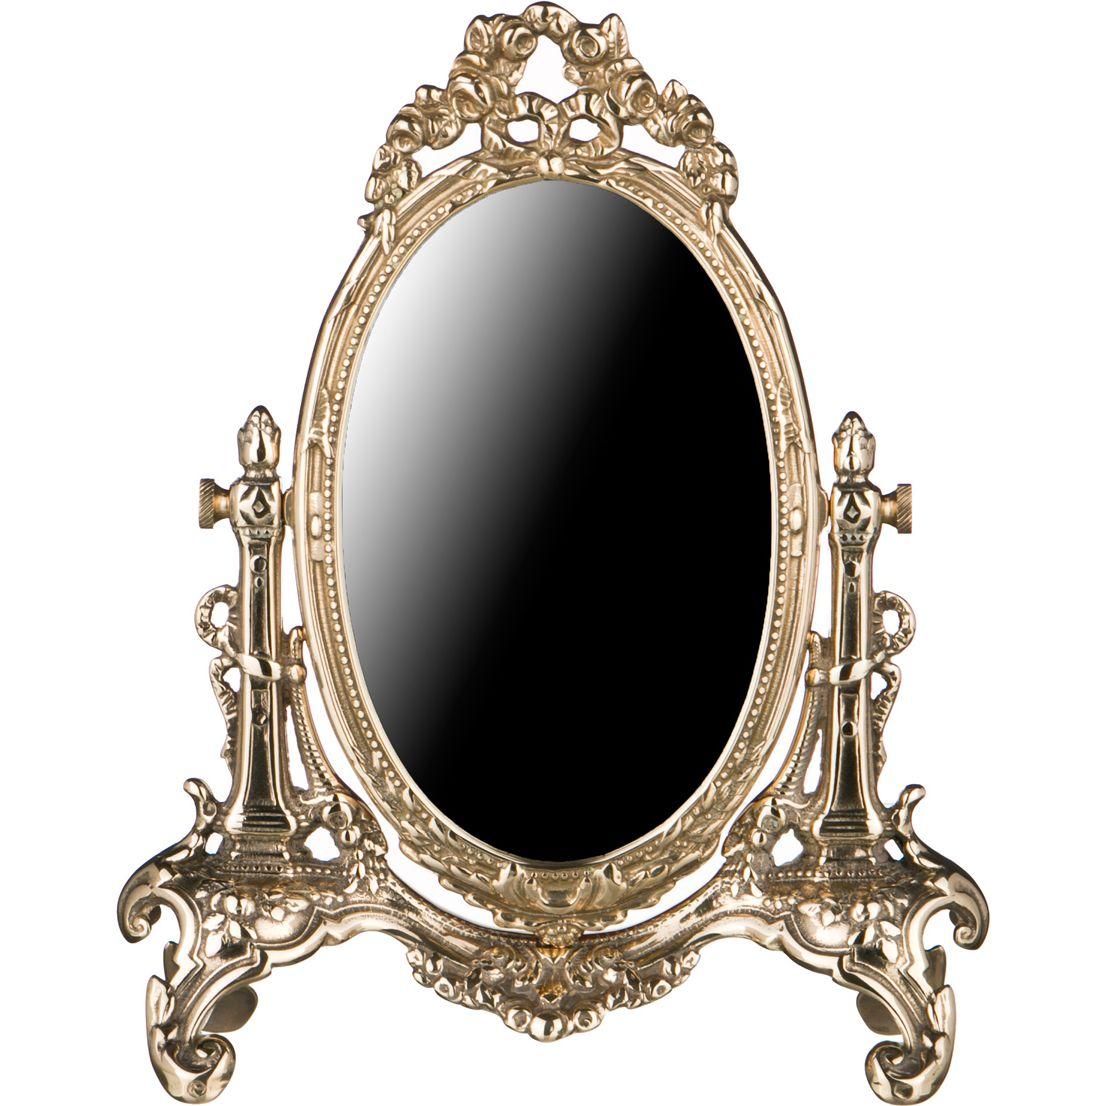 Зеркала Stilars Зеркало Людовик XVI (30 см) stilars фигурка kyla 9 см